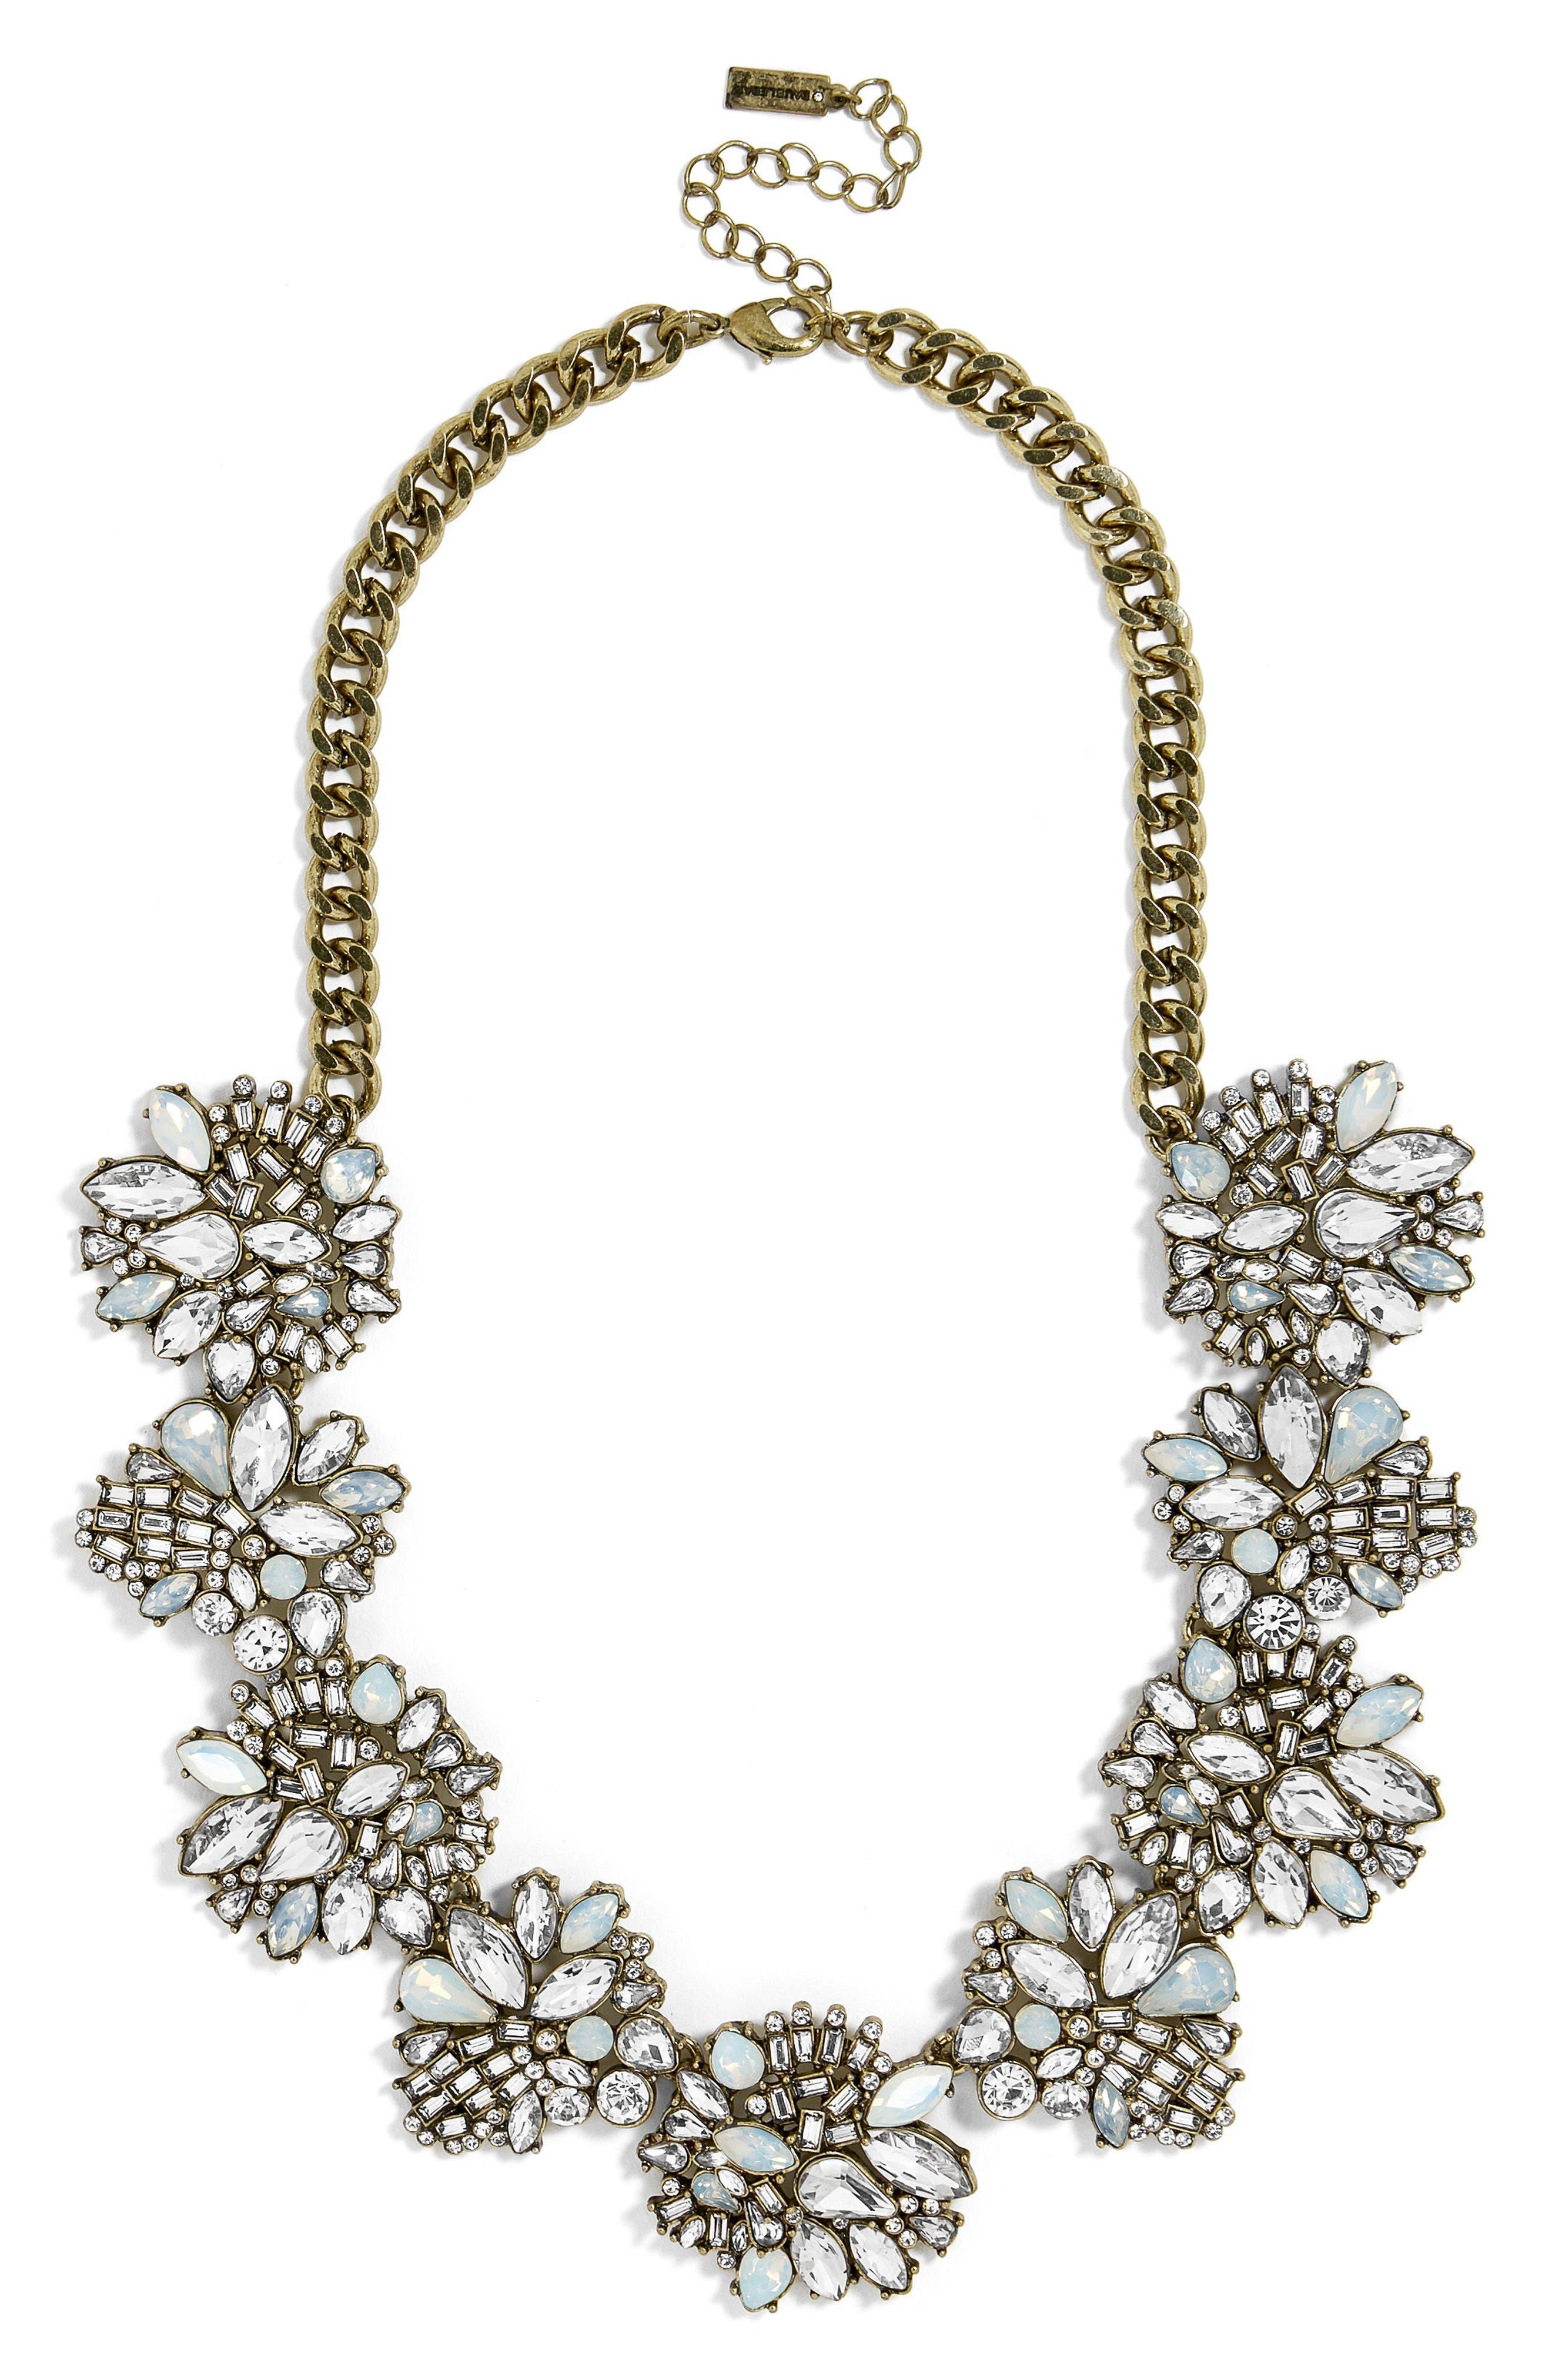 Main Image - BaubleBar Lissandra Crystal Statement Necklace